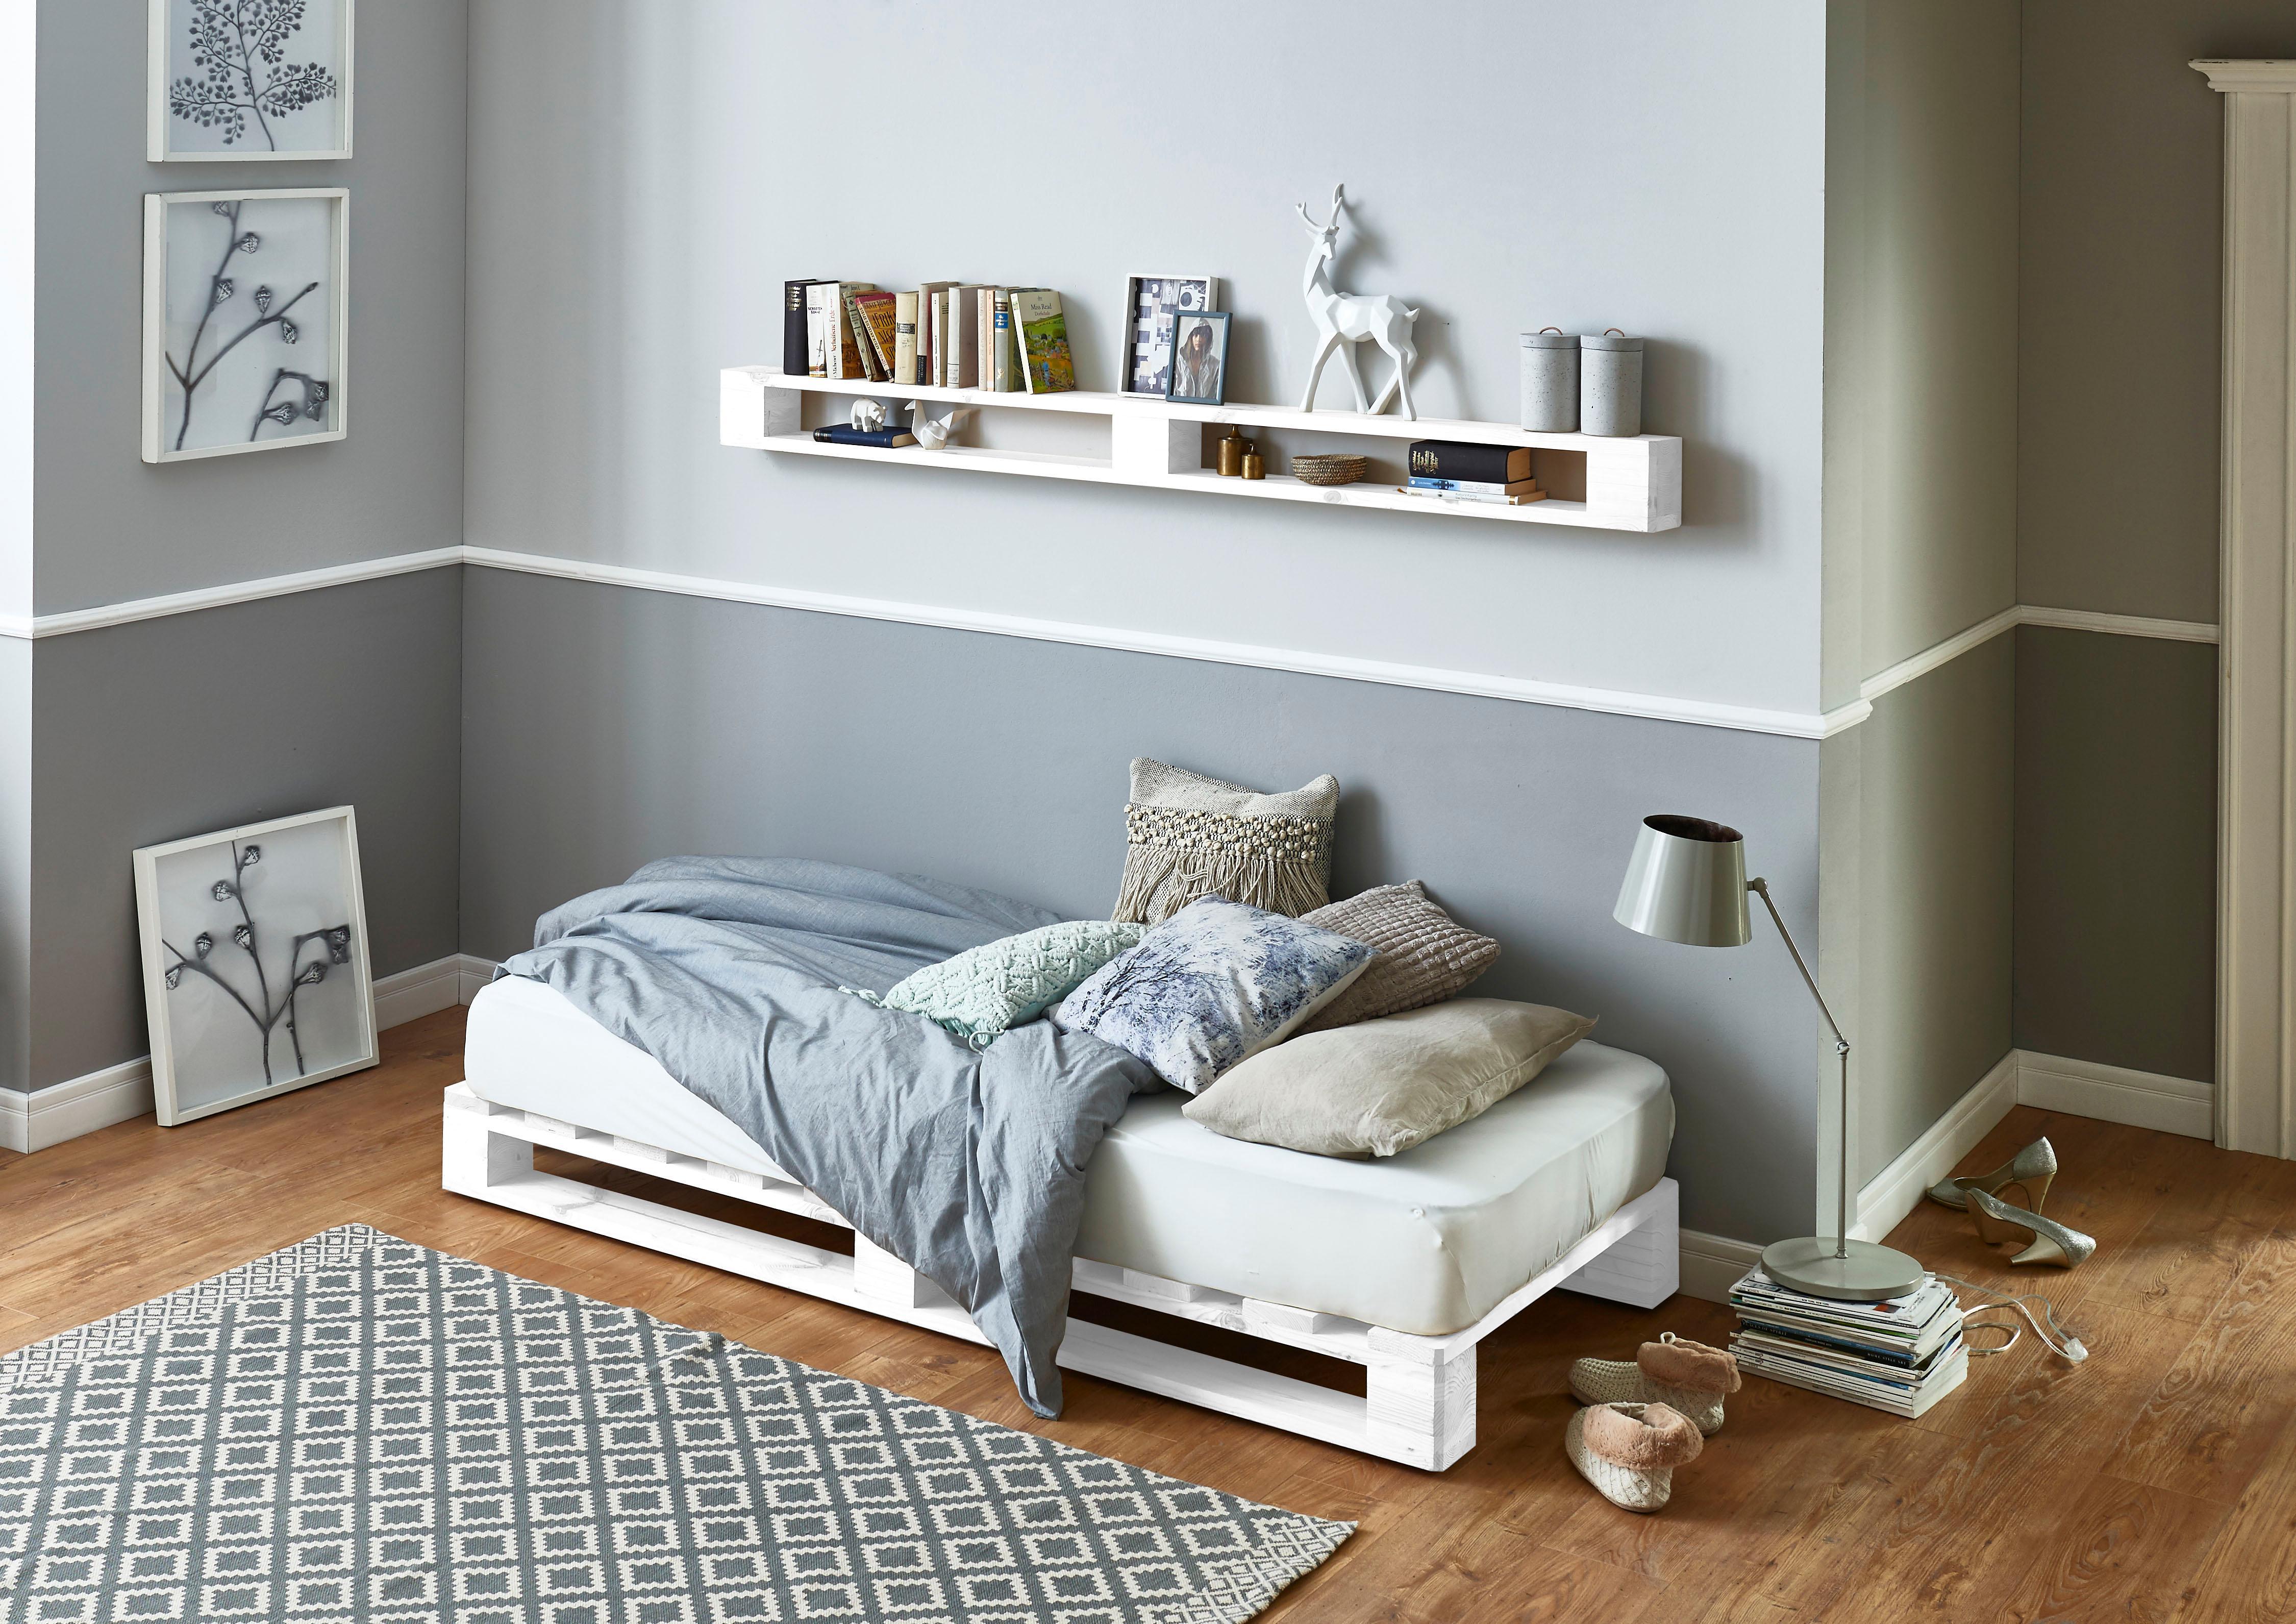 Image of ATLANTIC home collection Palettenbett